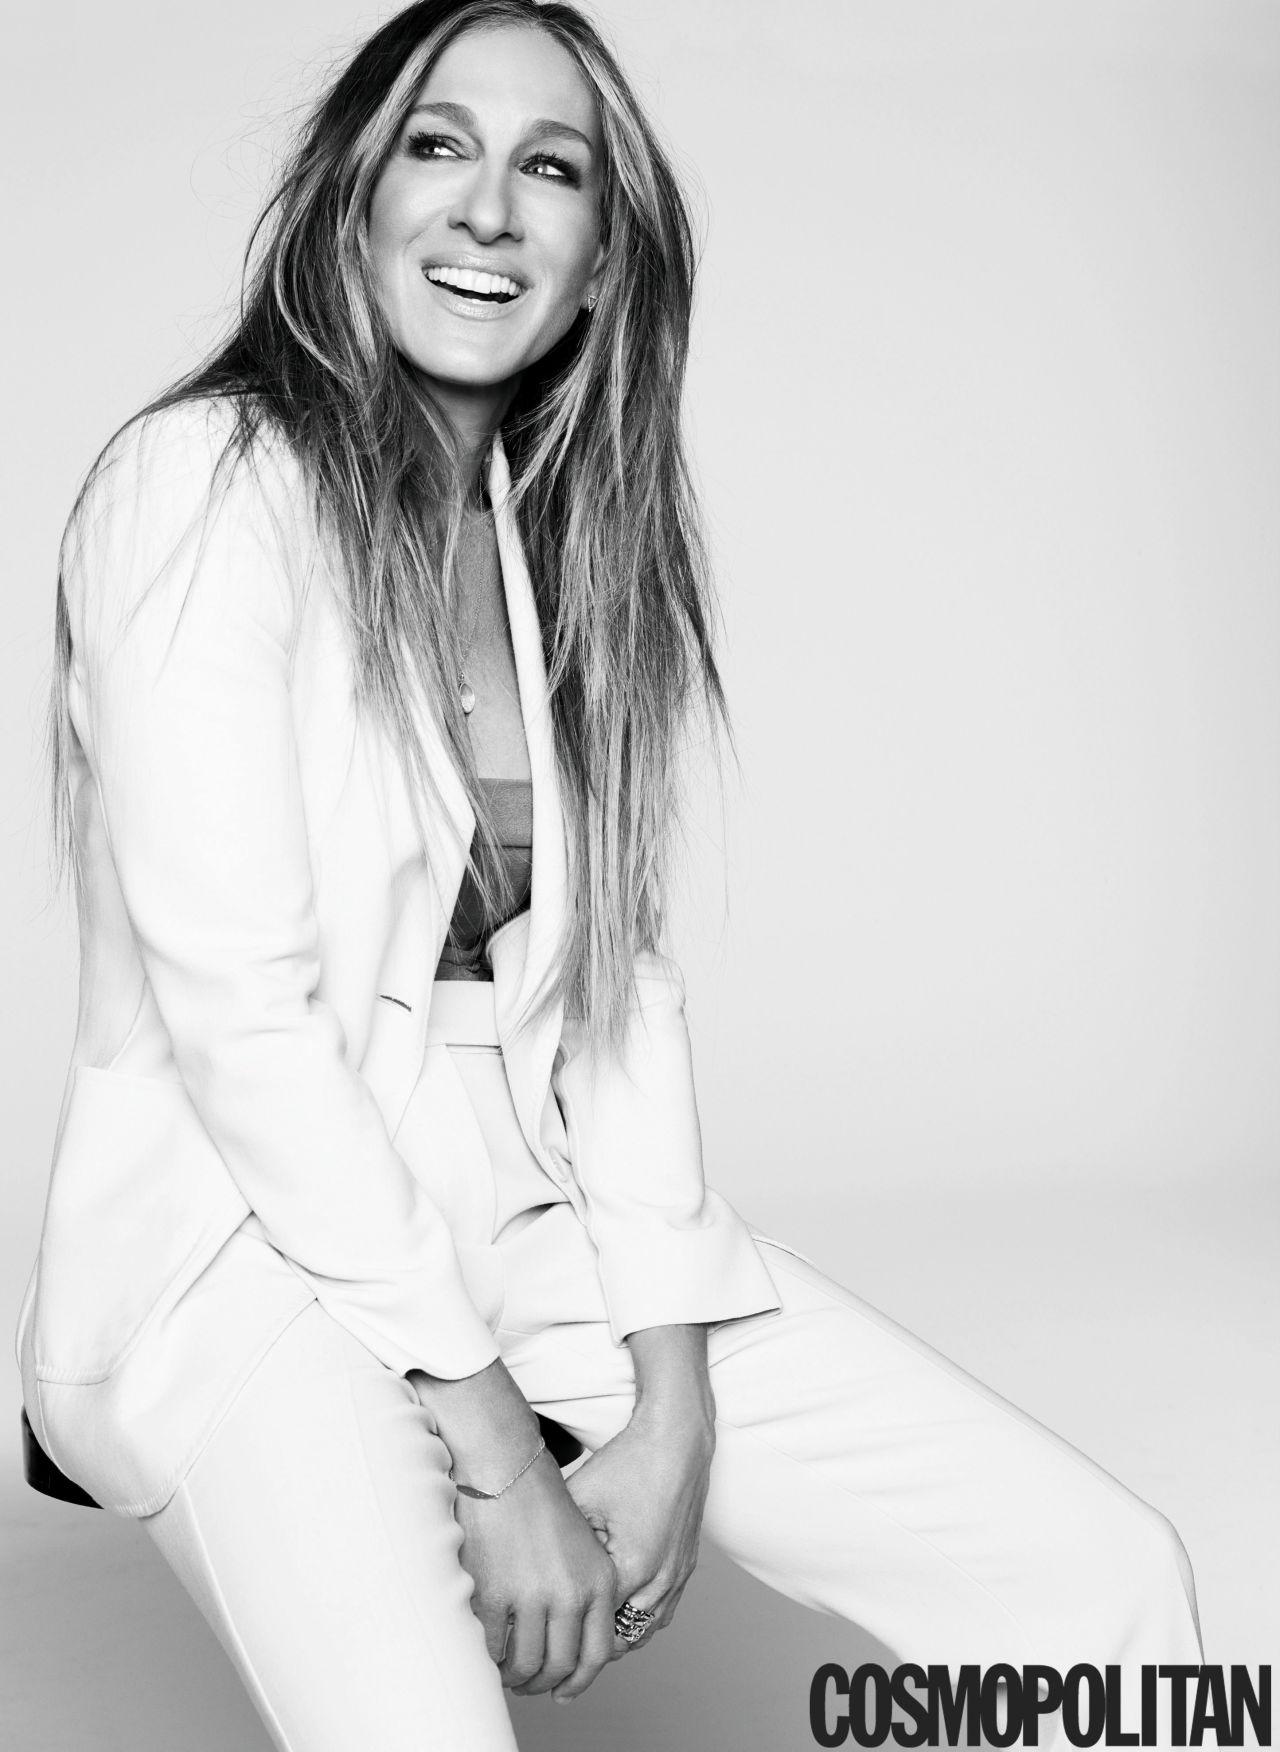 Актриса Сара Джессика Паркер в журнале Cosmopolitan